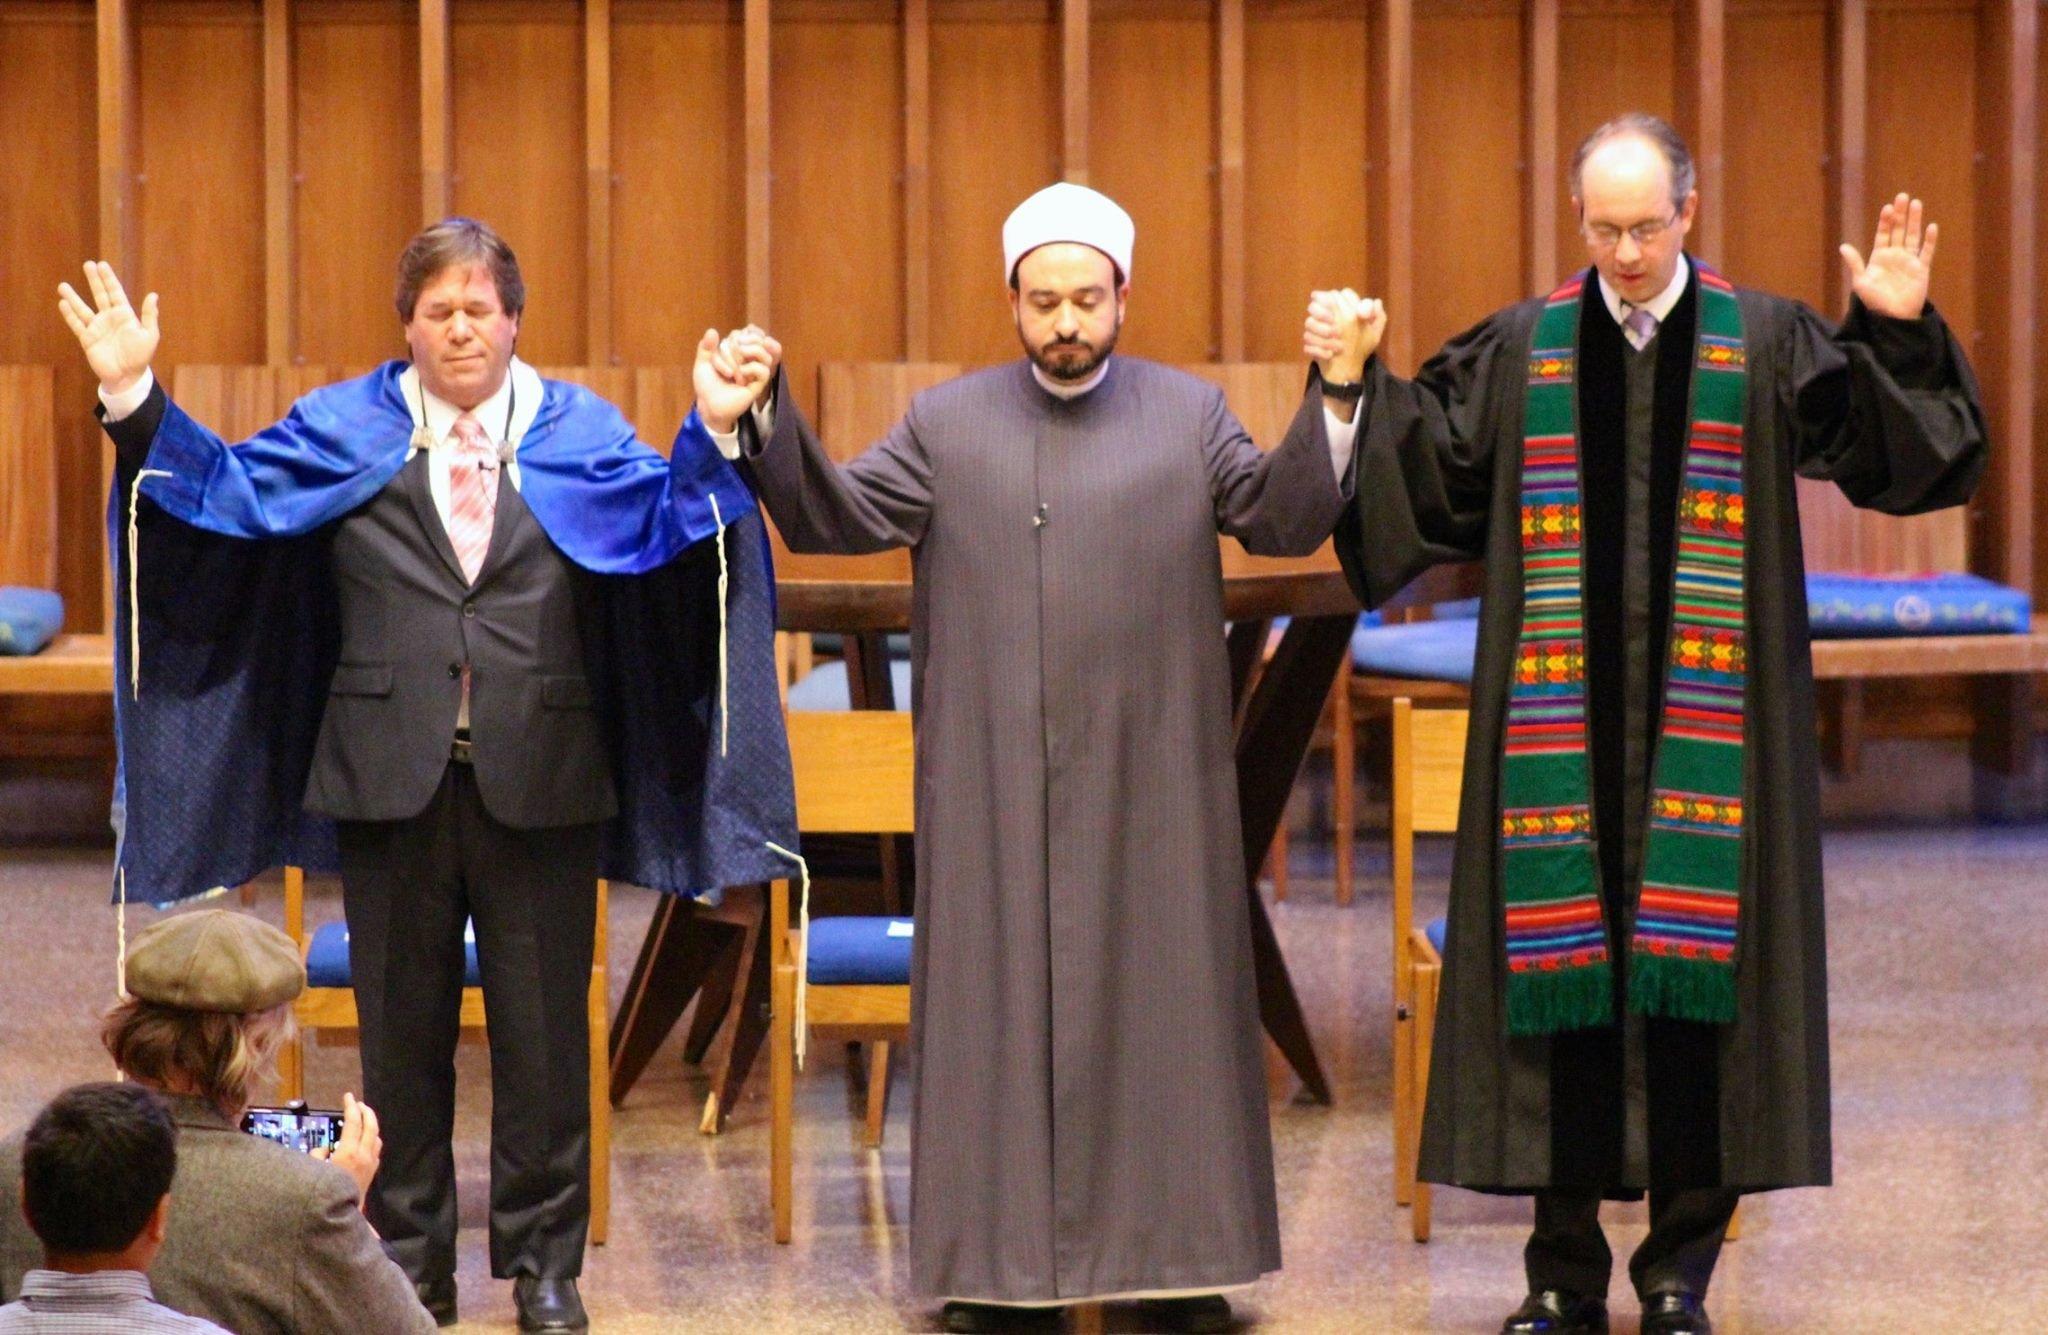 "<span class='image-component__caption' itemprop=""caption"">Rabbi Schnitzer, Dr. Tarek Elgawhary and Pastor David Gray pray together during an interfaith service atBradley Hills Presbyterian Church inBethesda, Maryland.</span>"